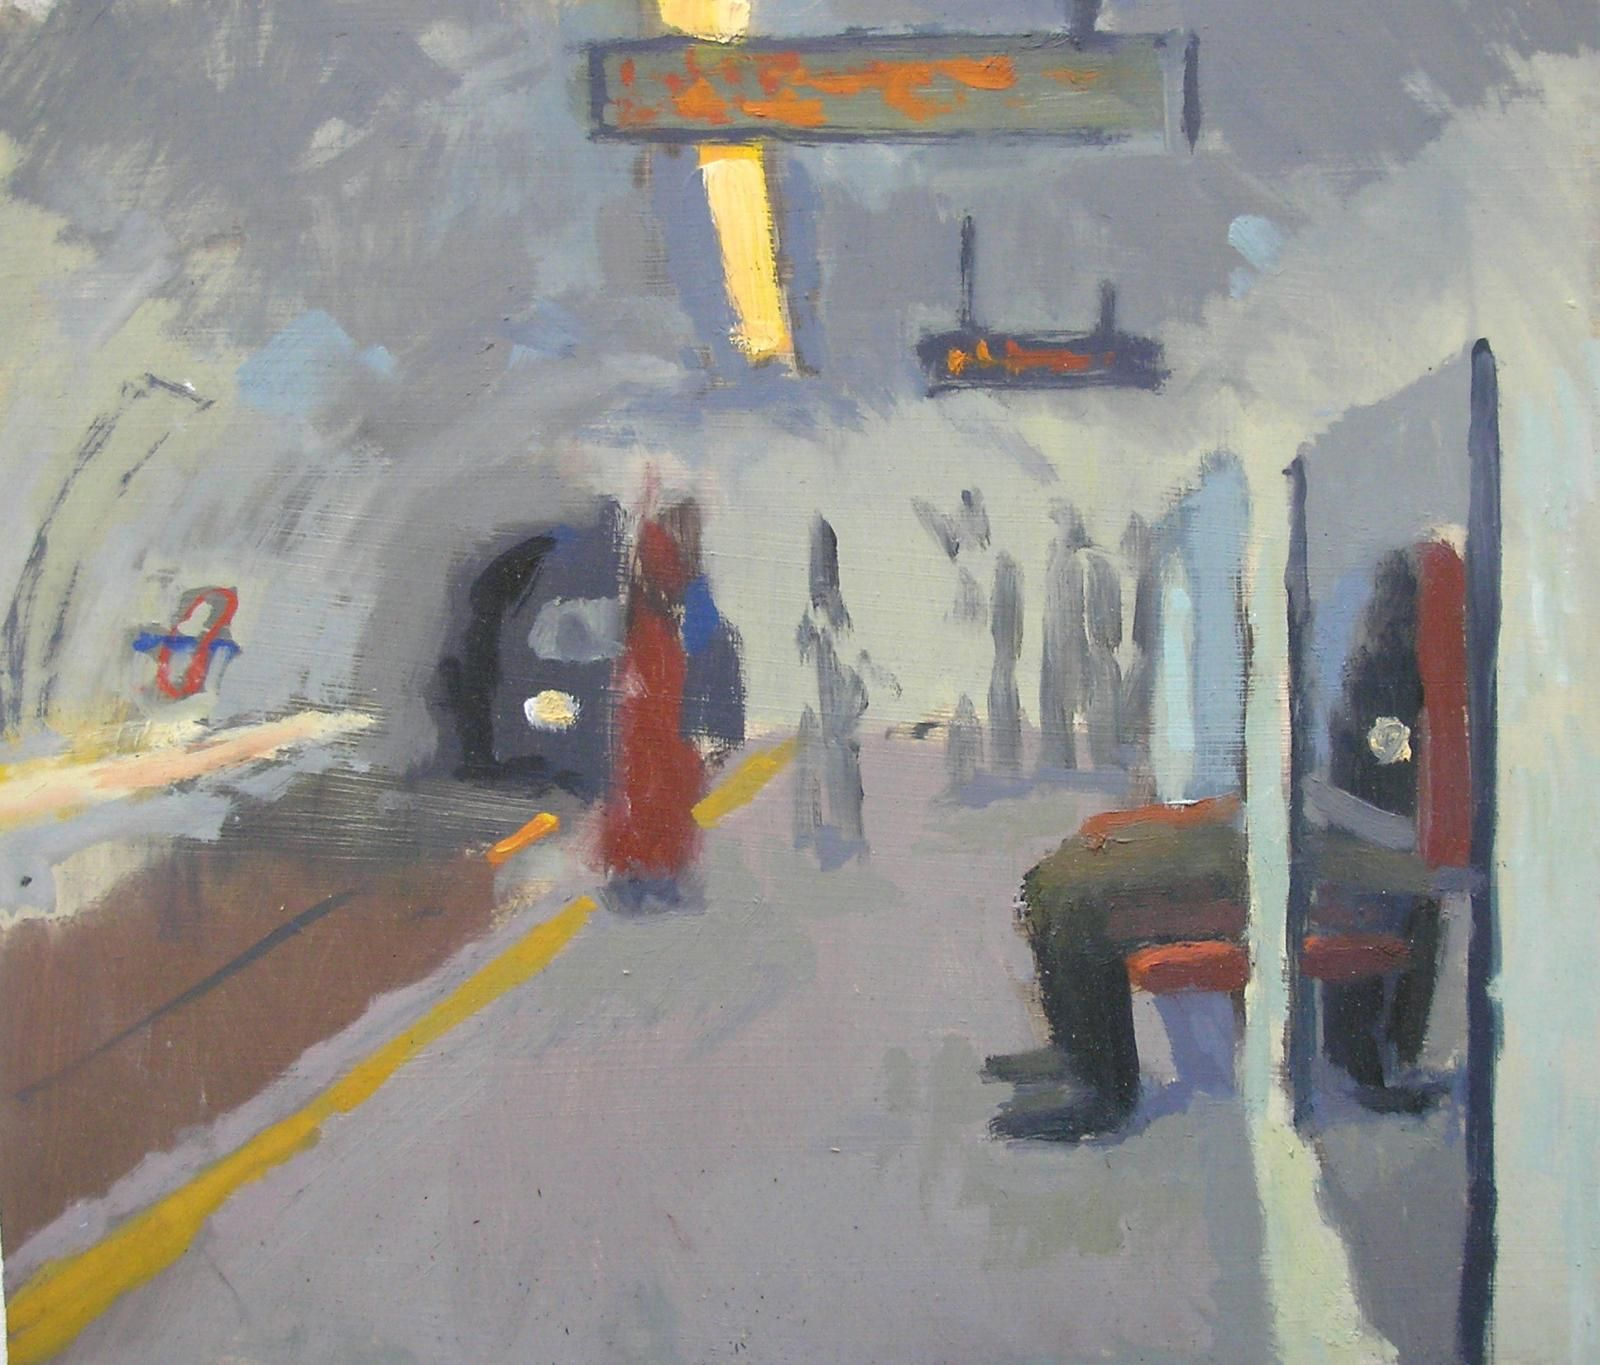 London Underground Art